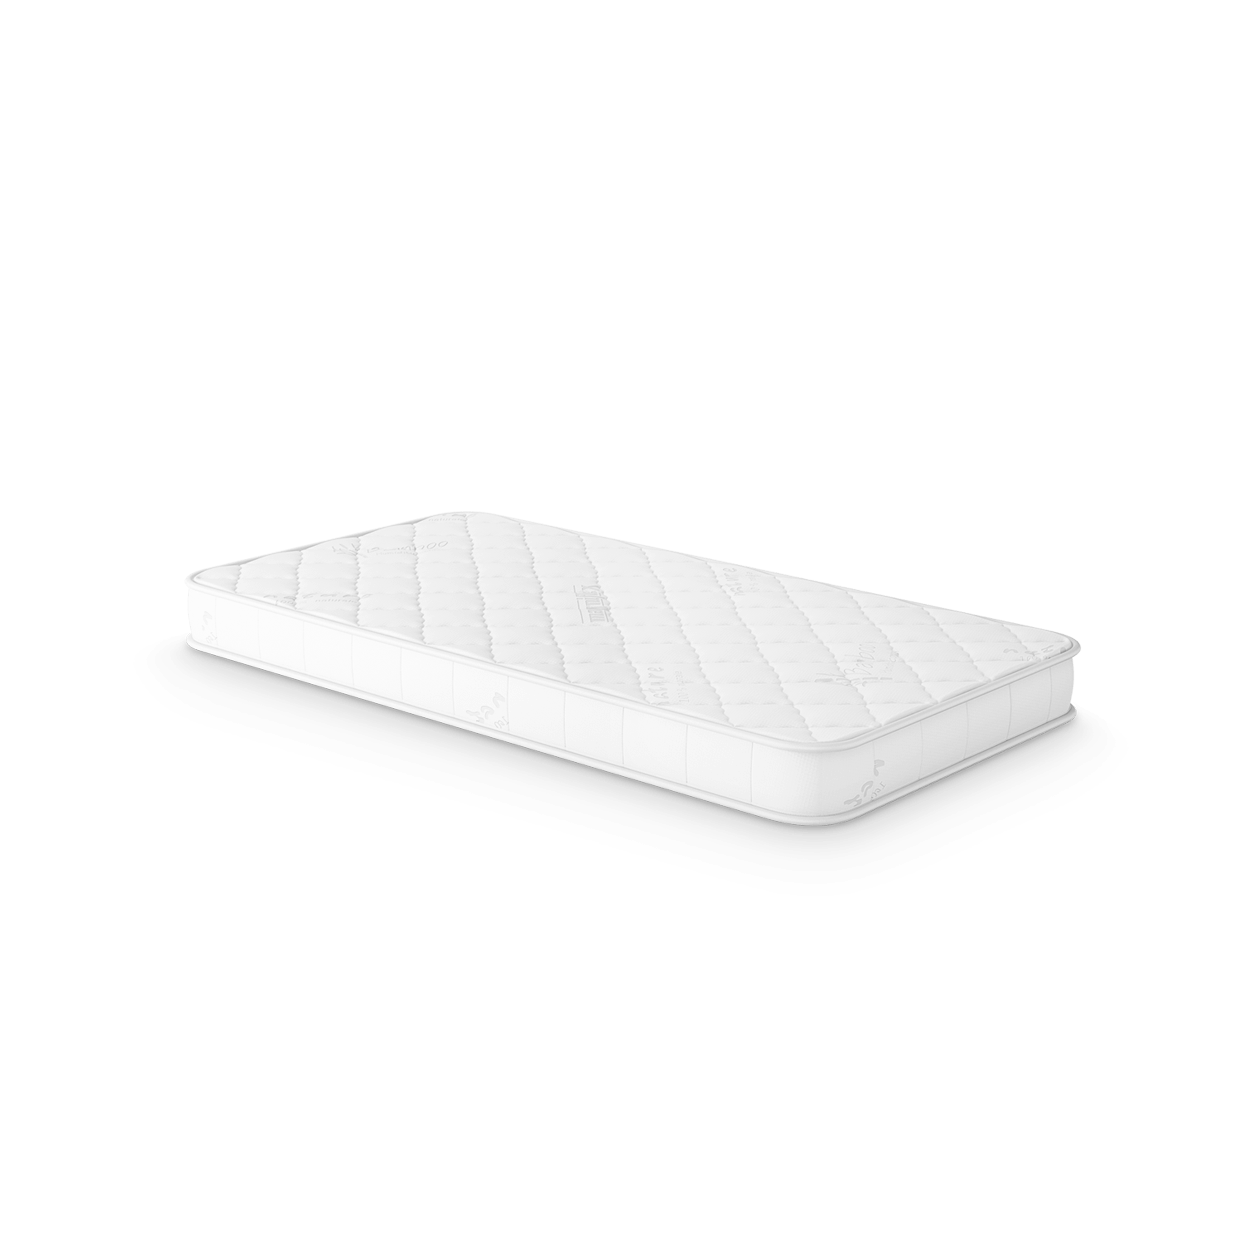 Fiaba bamboo матрак, от Magniflex